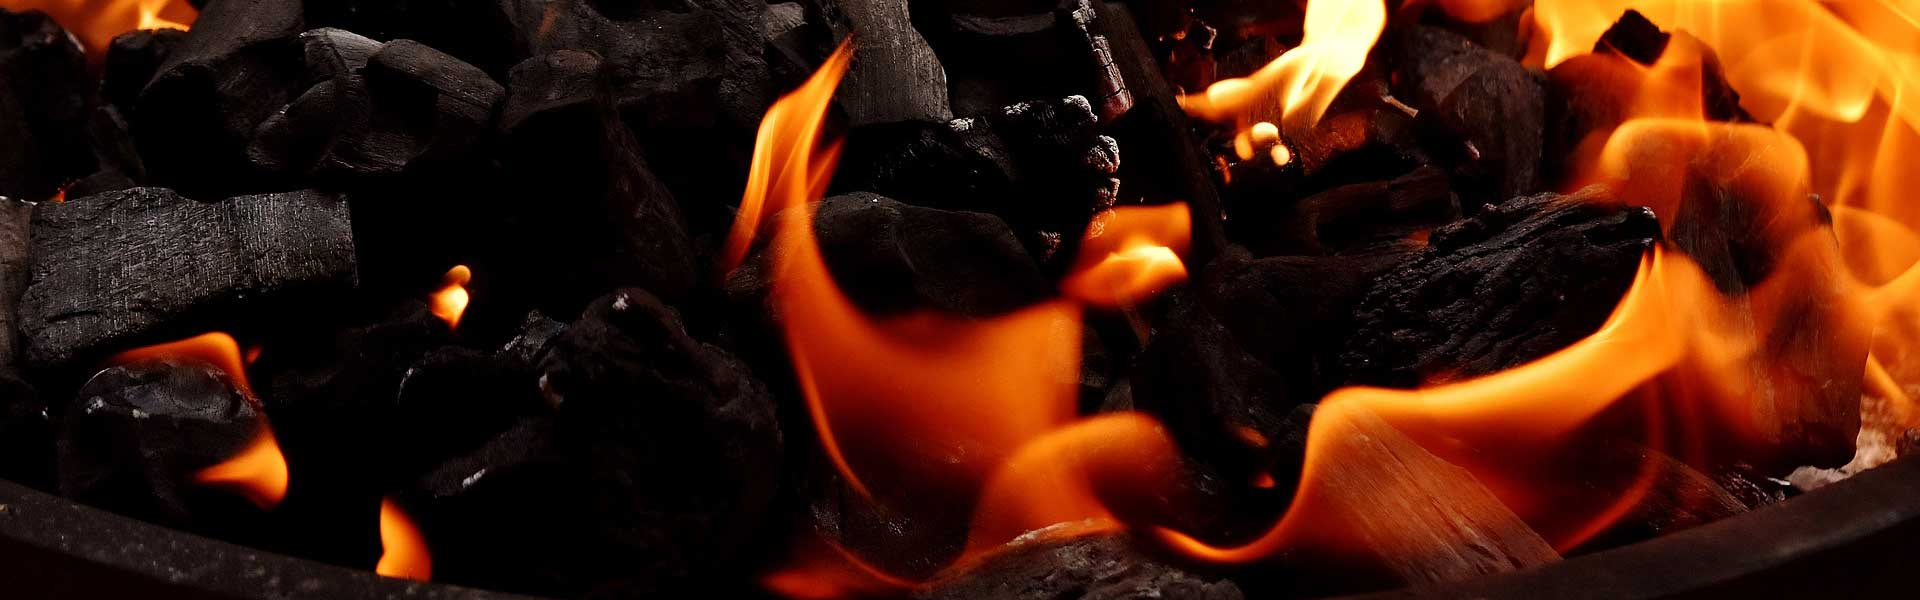 Finglas Fuels Dublin Coal Merchant - Best coal and hardwood logs prices in Dublin